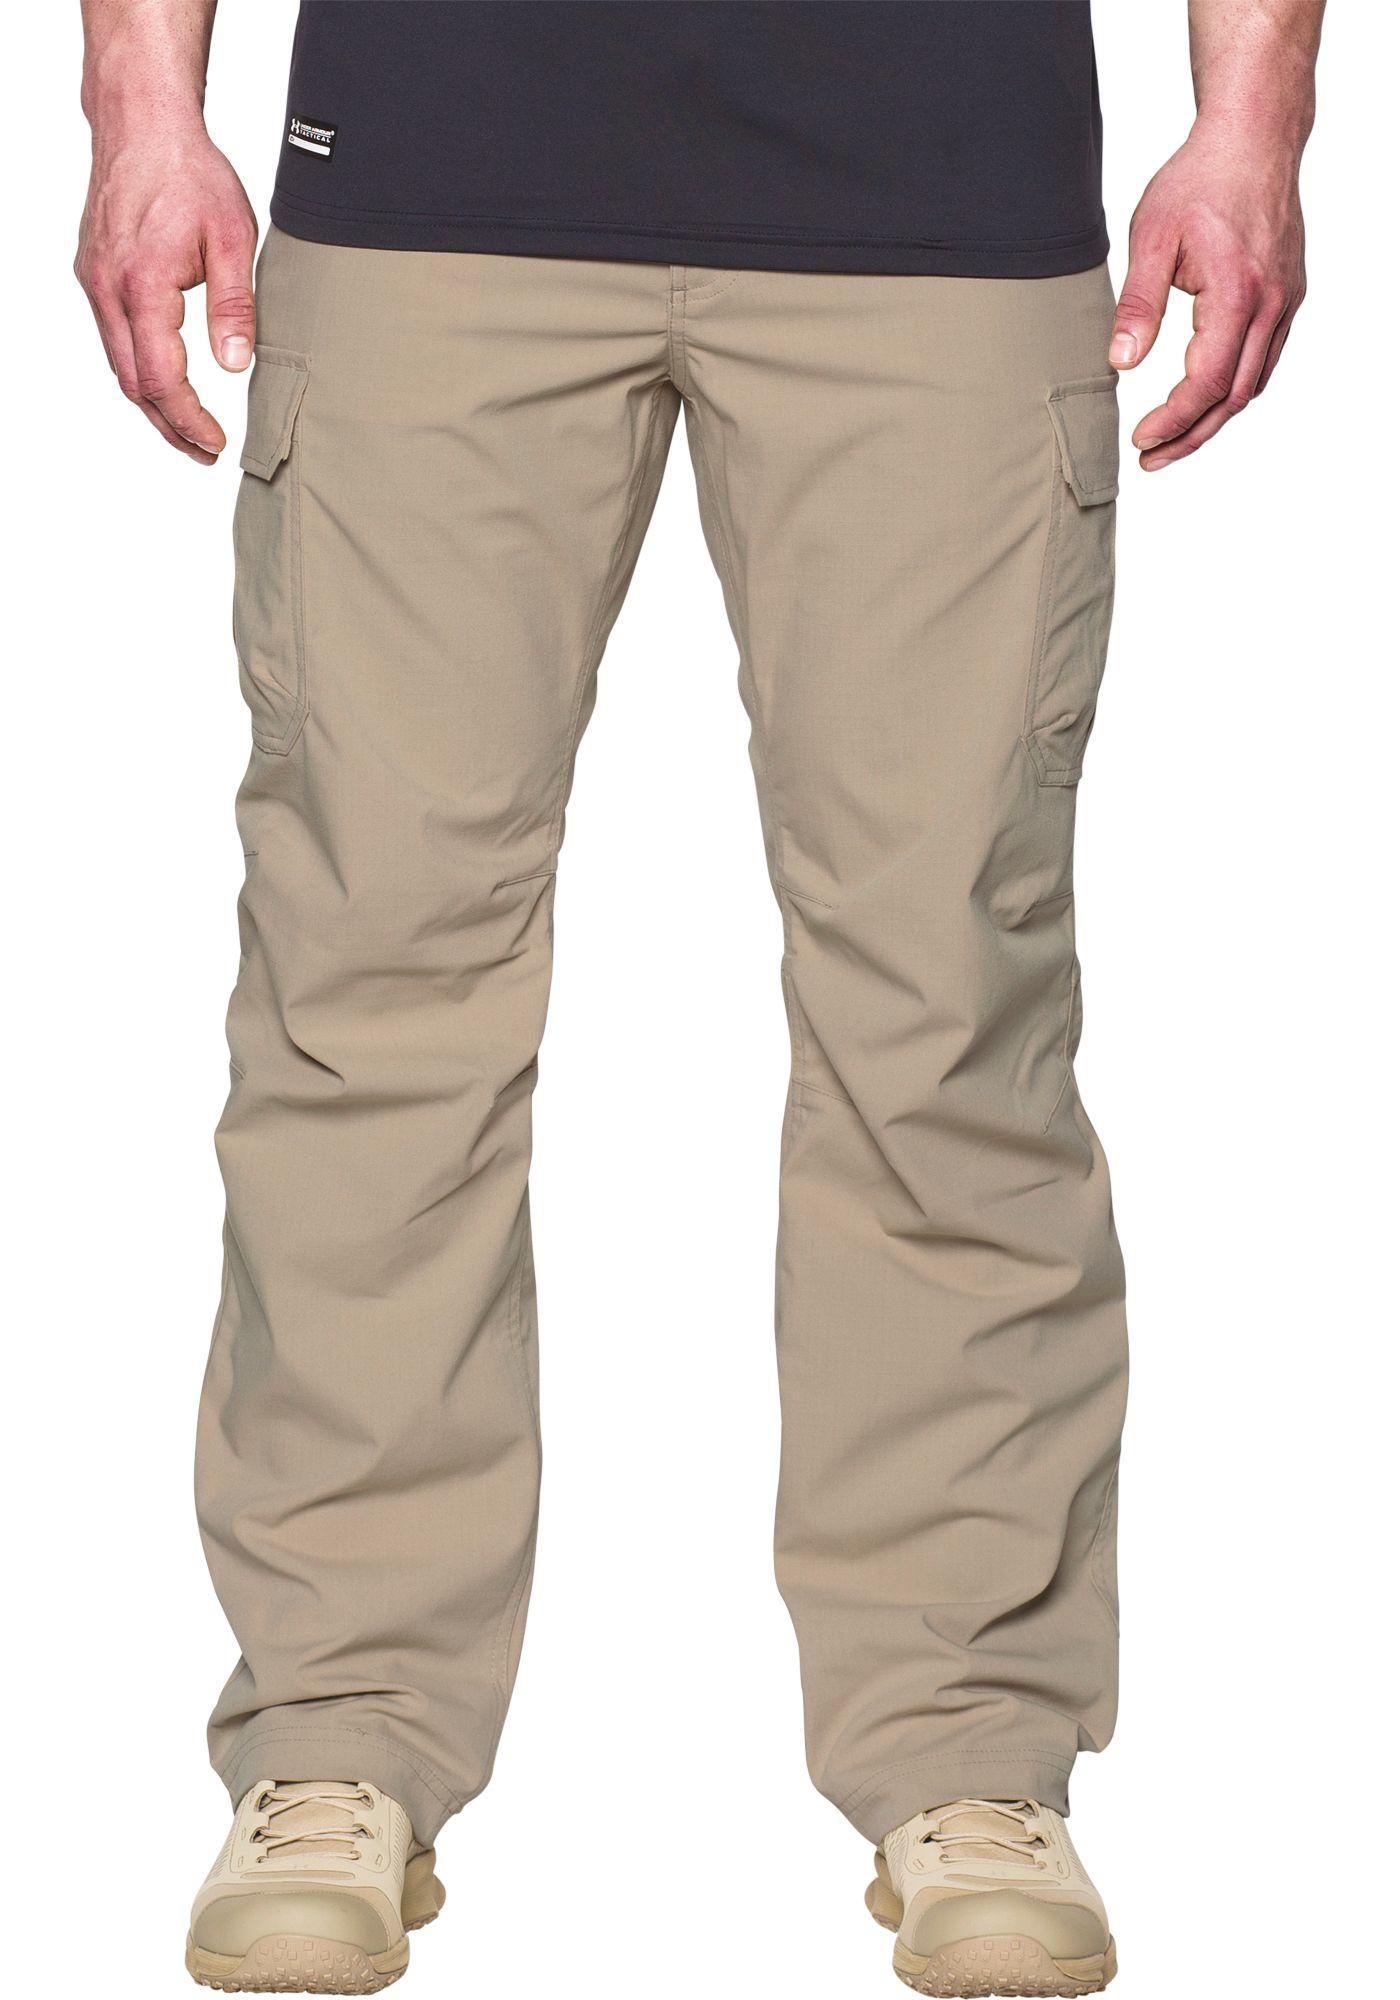 Under Armour Storm Tactical Patrol Pants